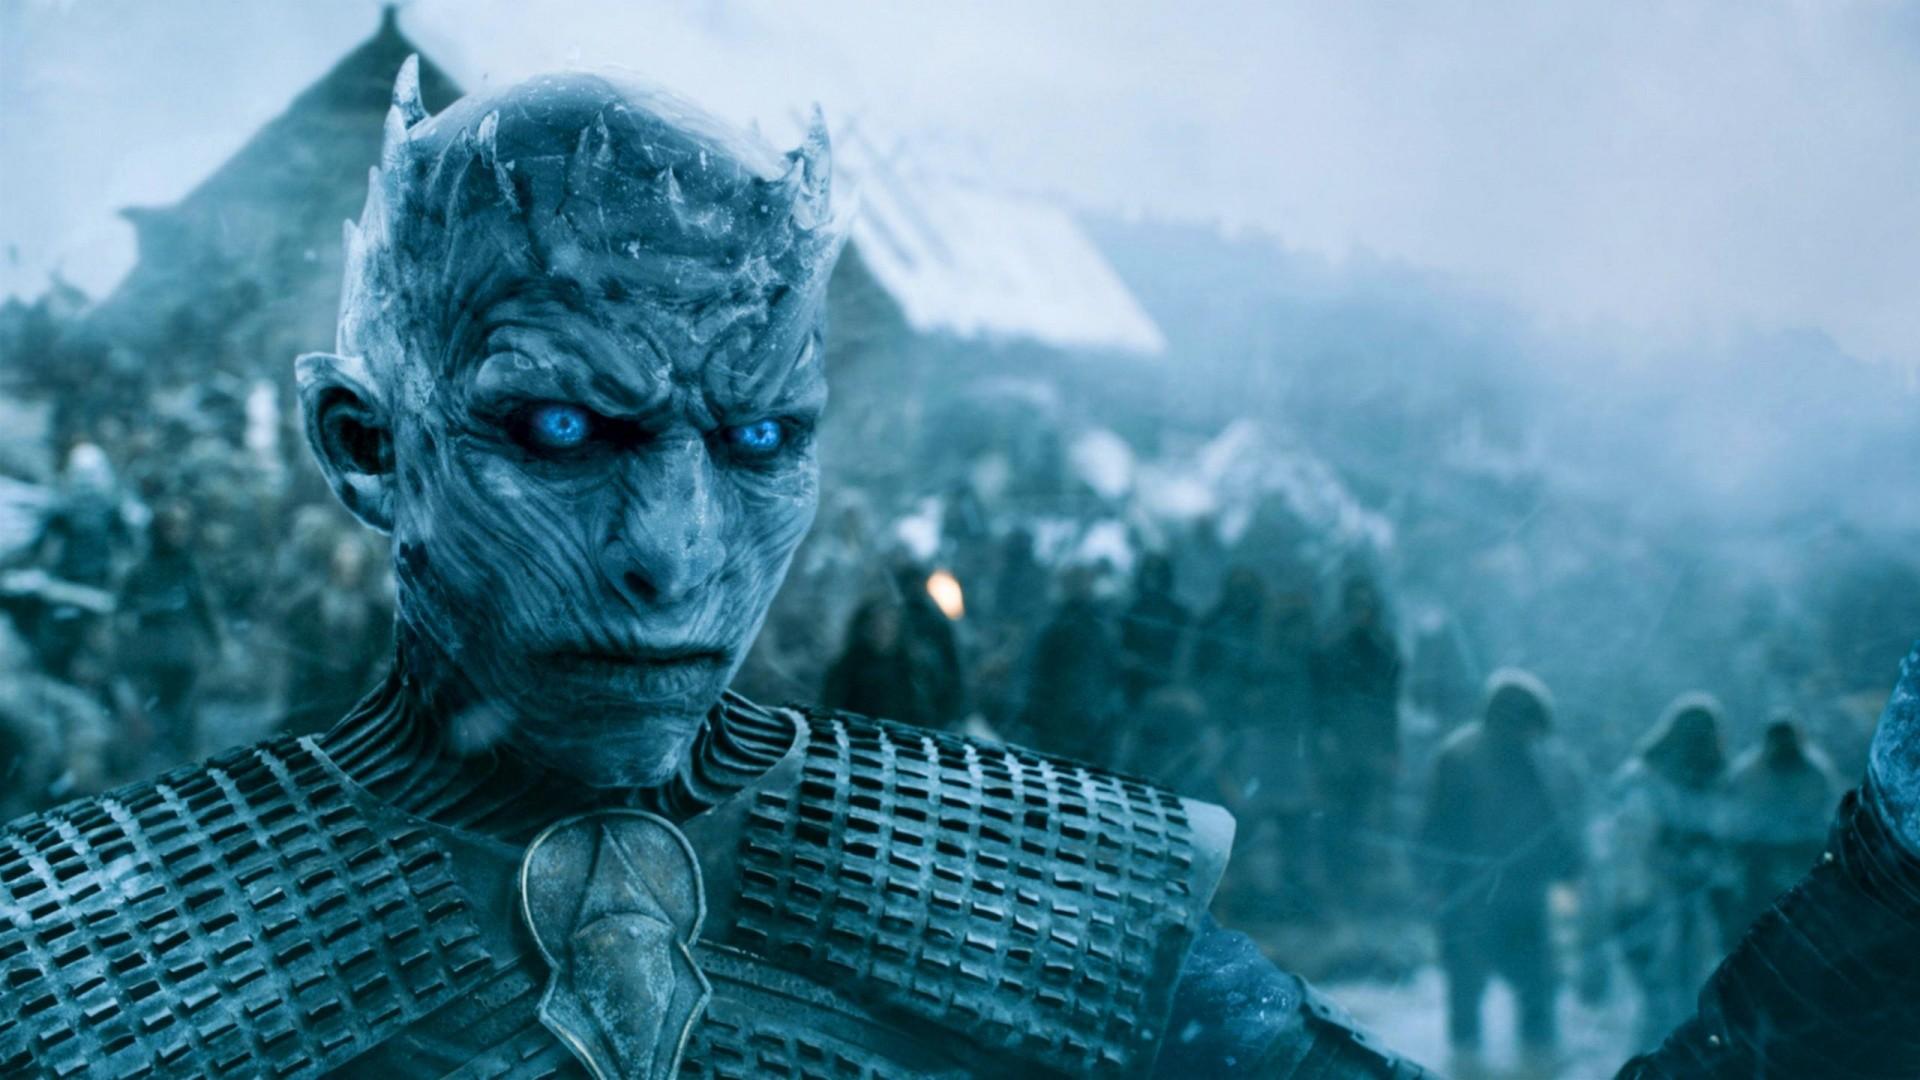 Game Of Thrones White Walker King